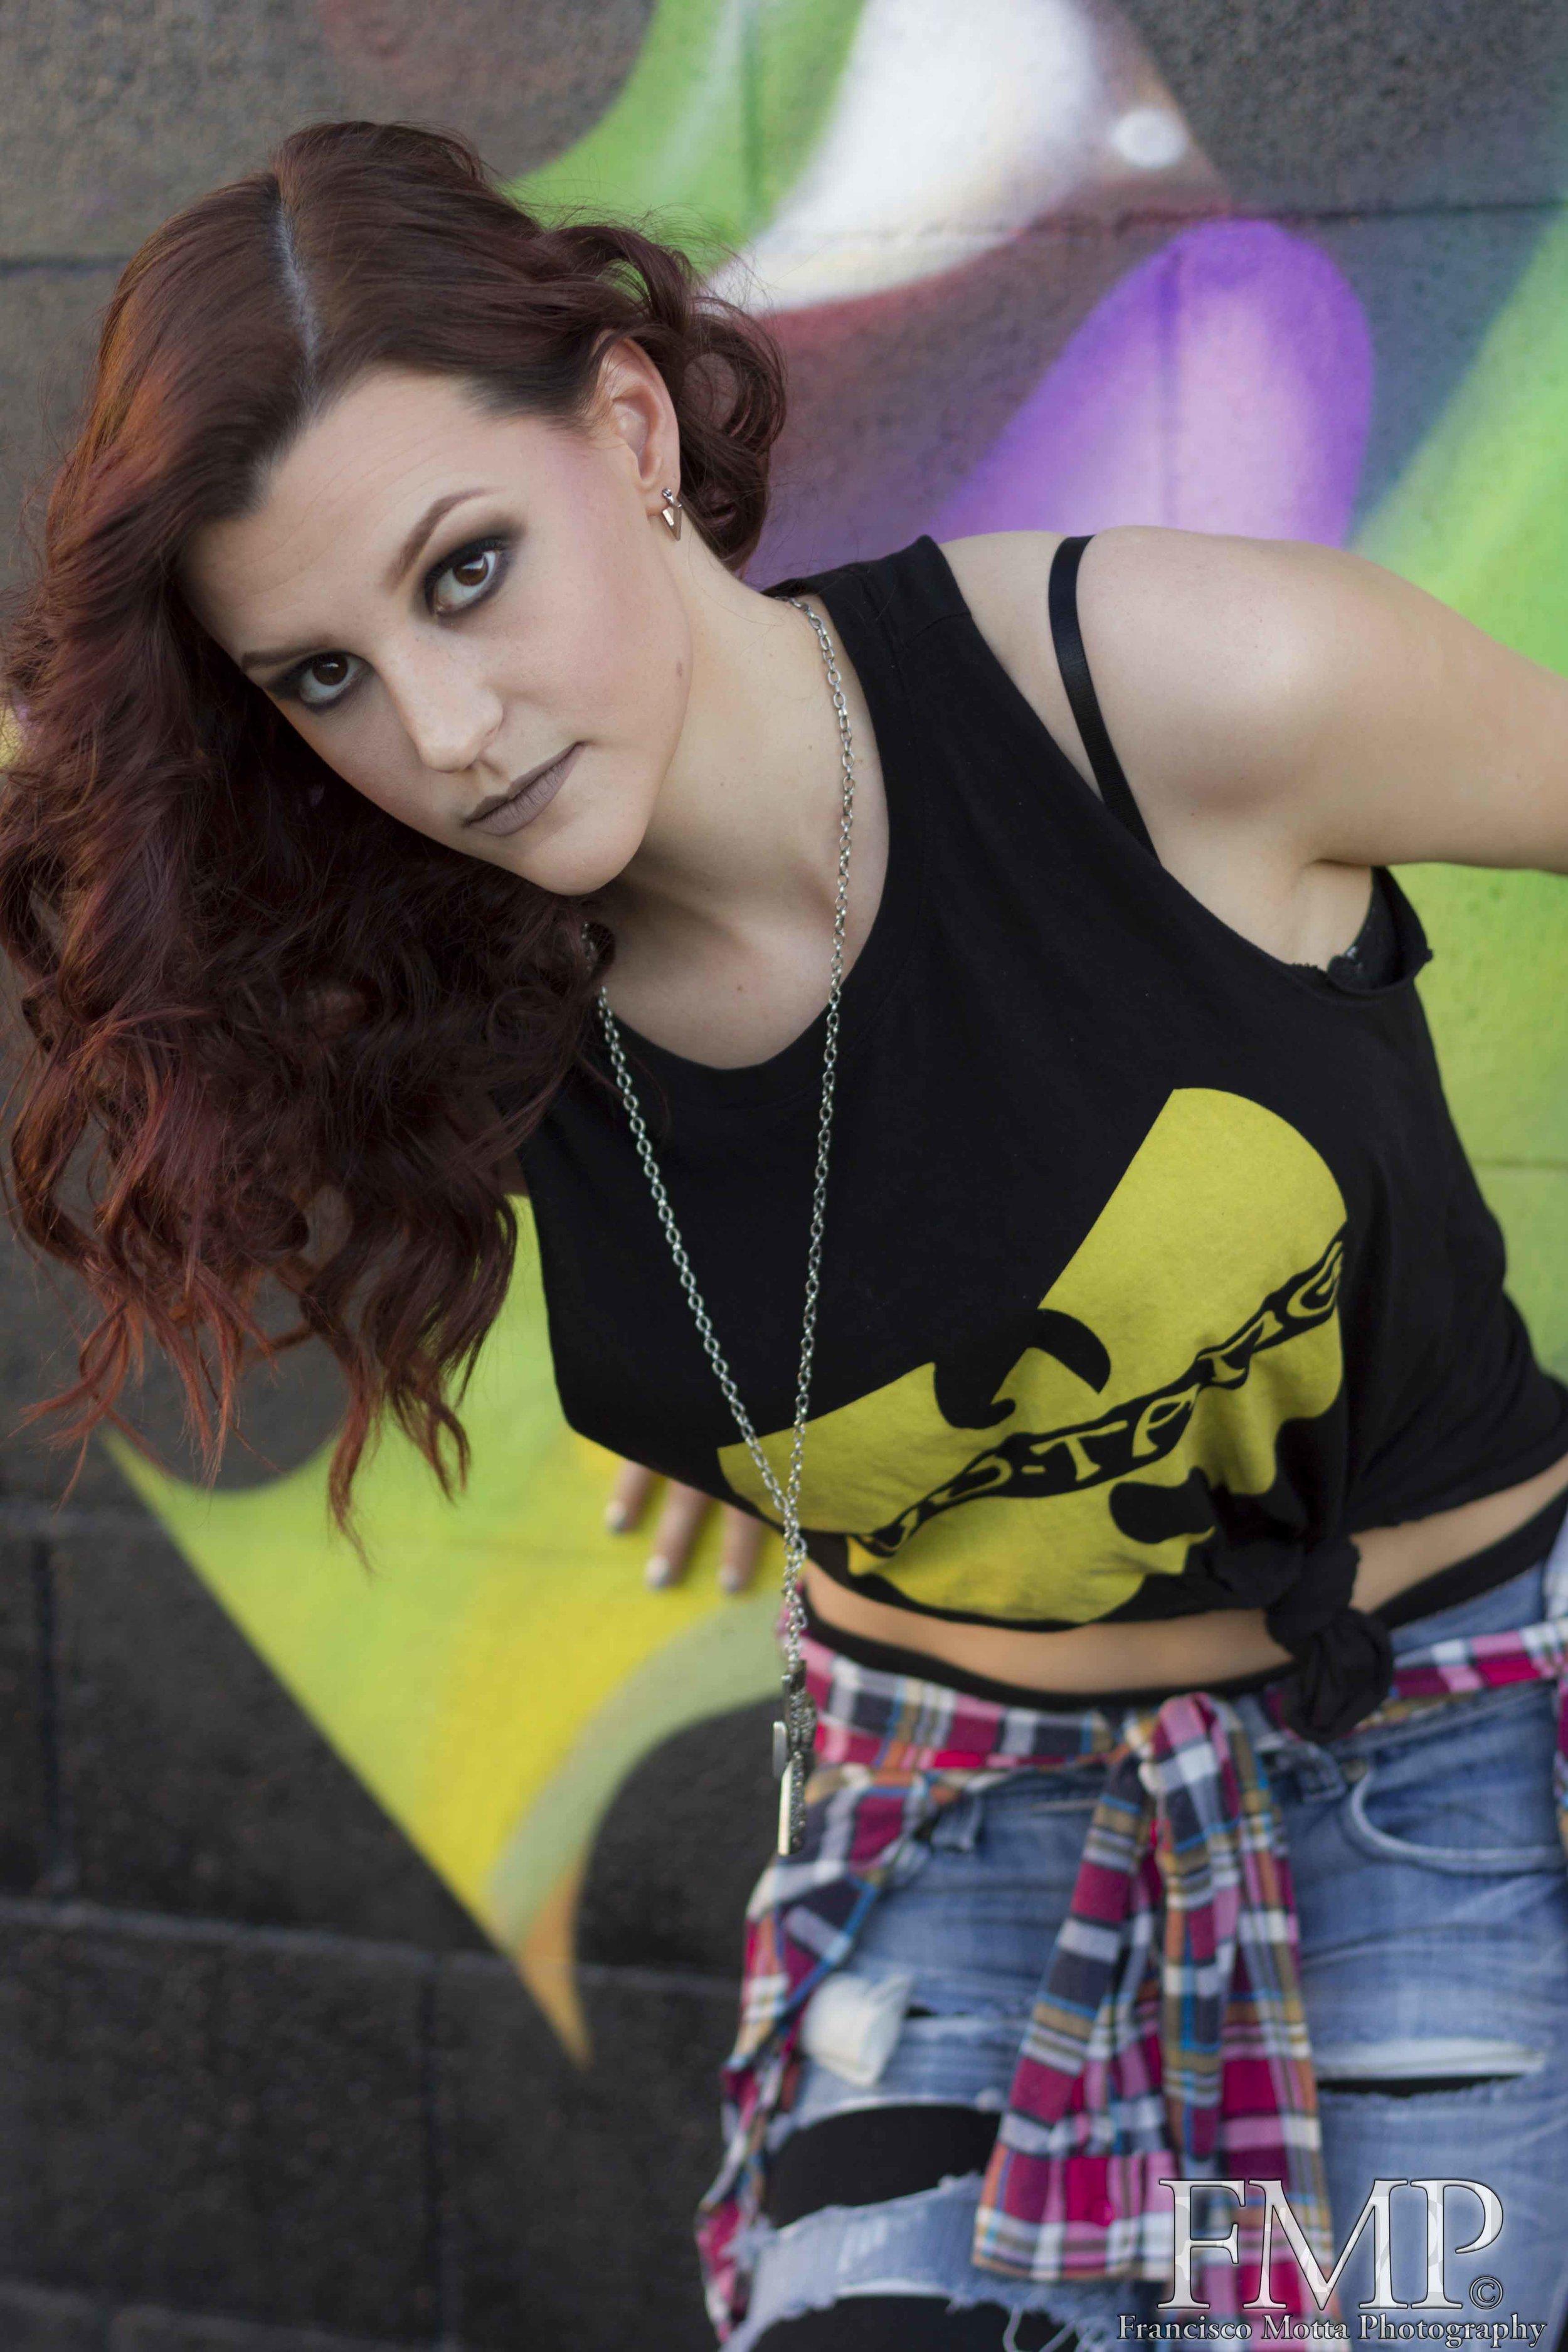 Model: Andrea  Hair & Makeup: Faces By Amelia (Tanya Amelia White)  Photography: Francisco Motta Photography